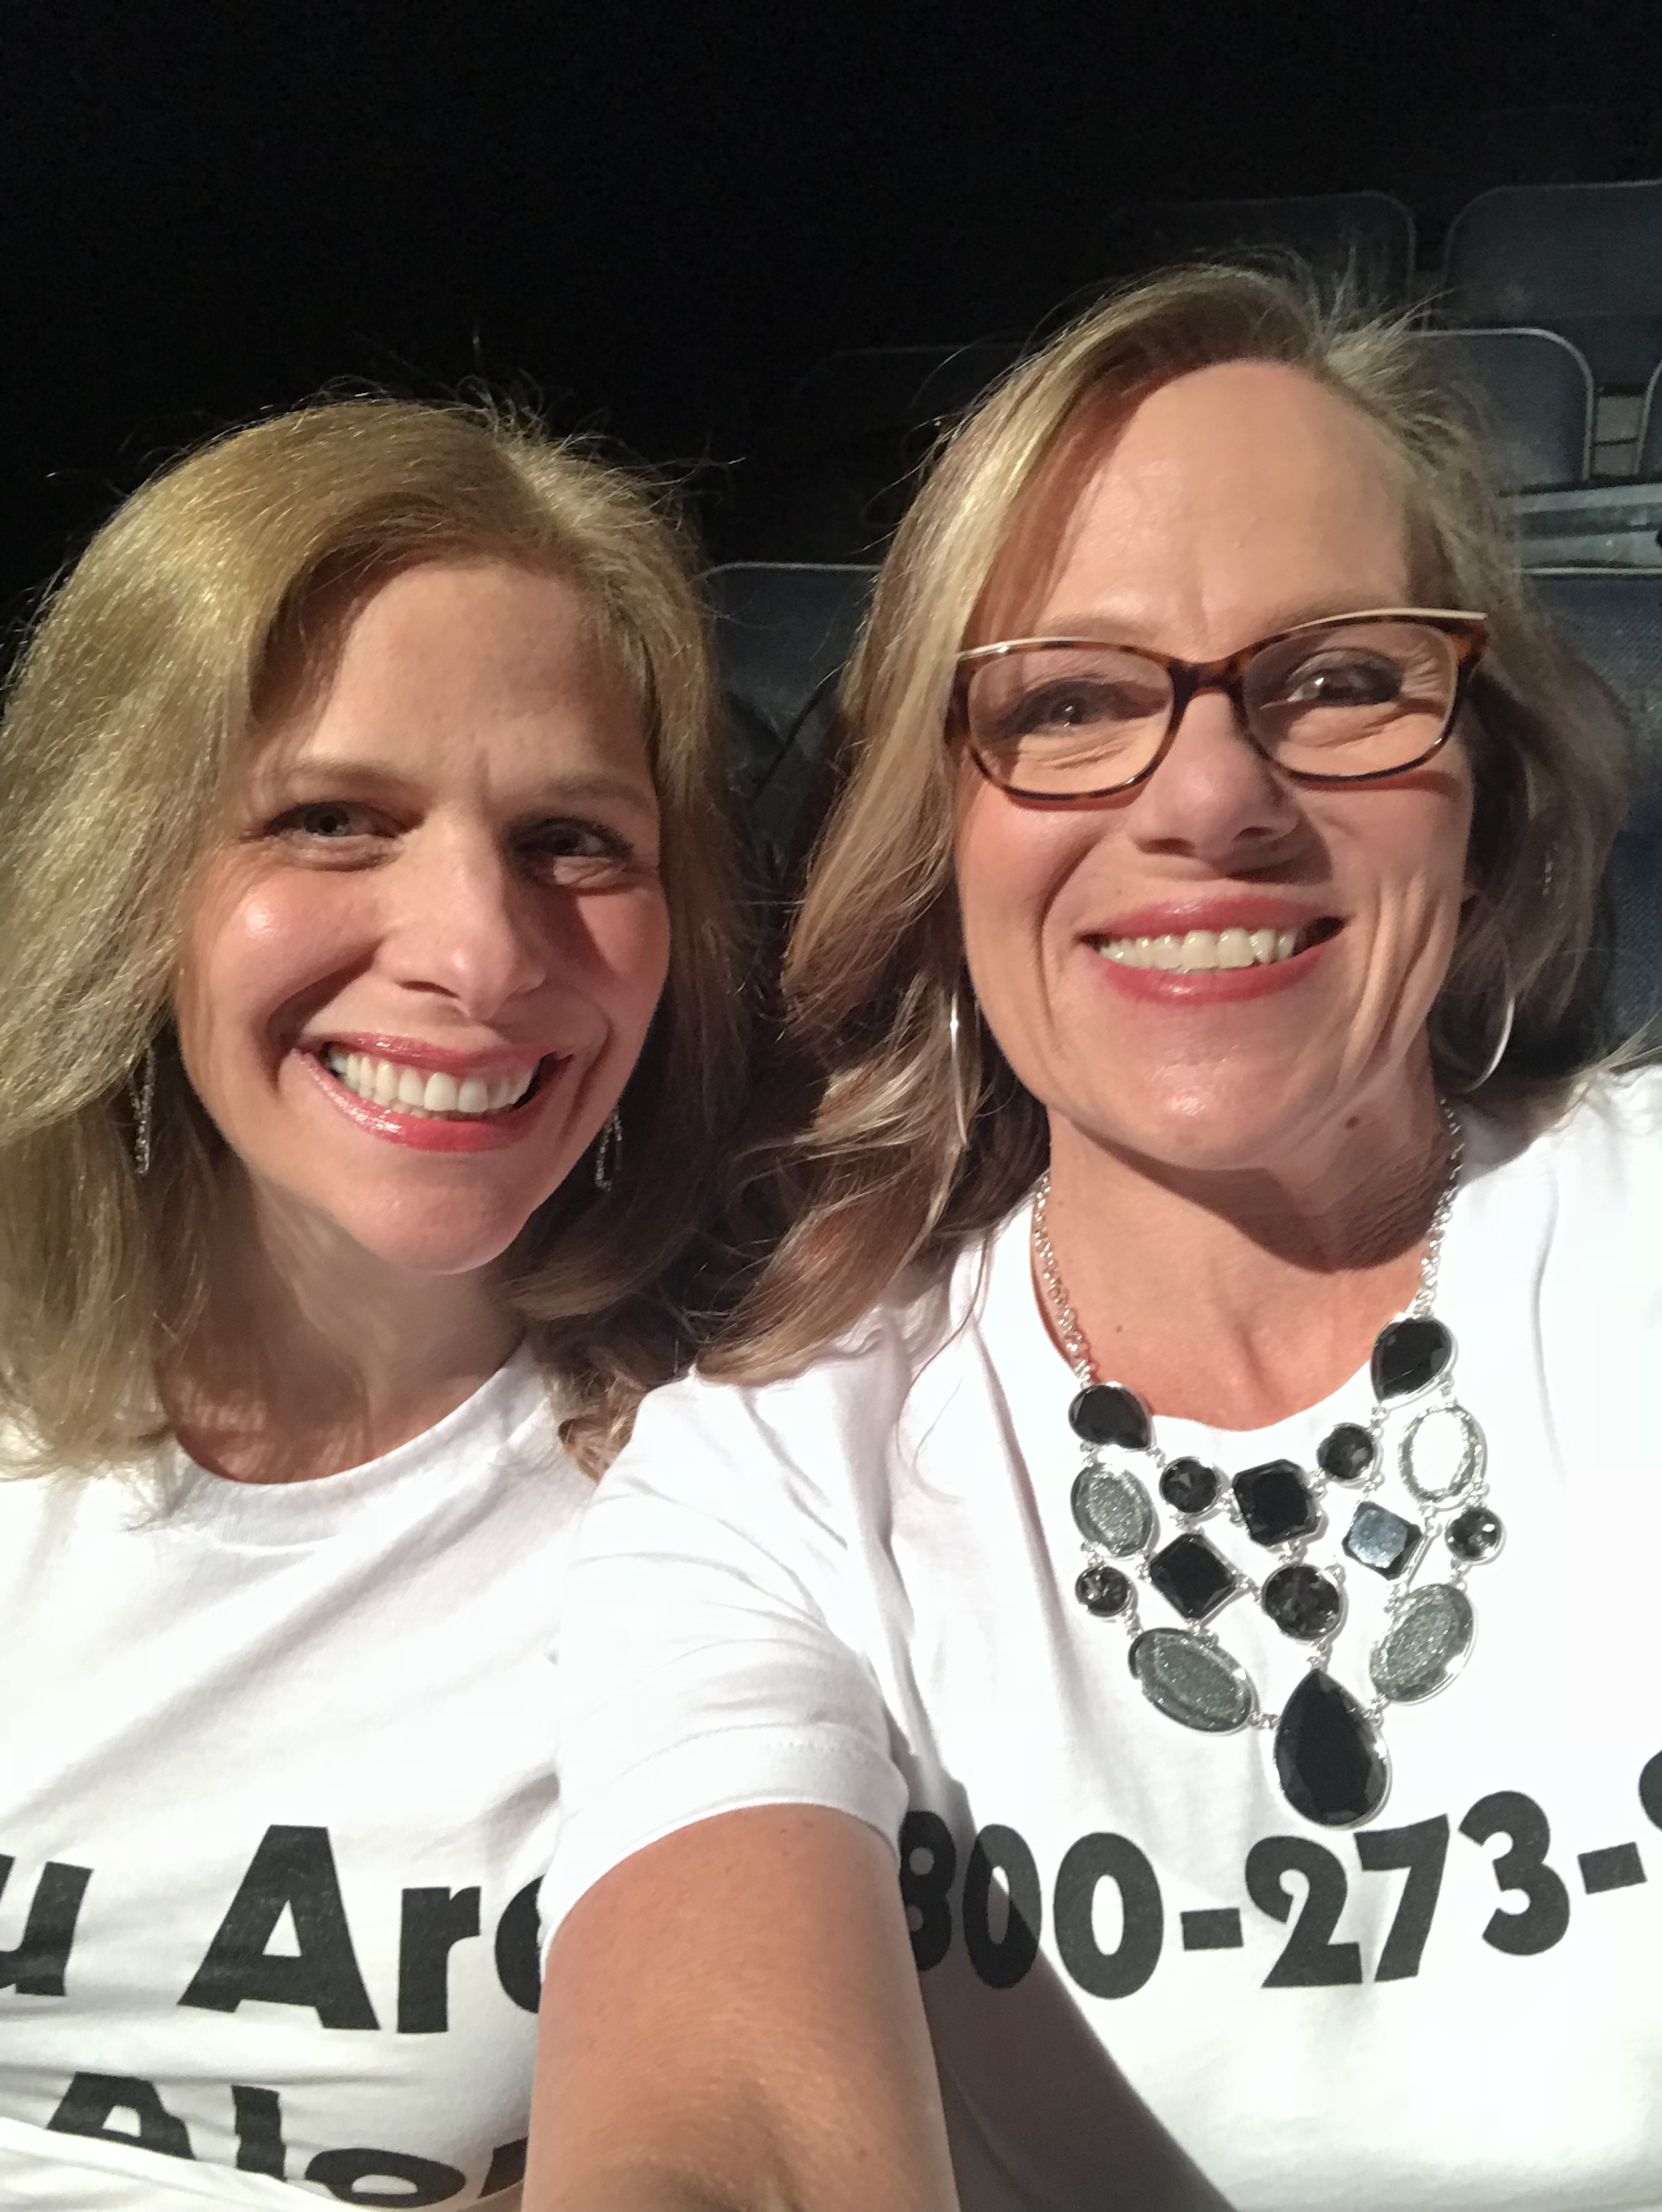 Fellow sister-on-a-mission, Joanne Harpel